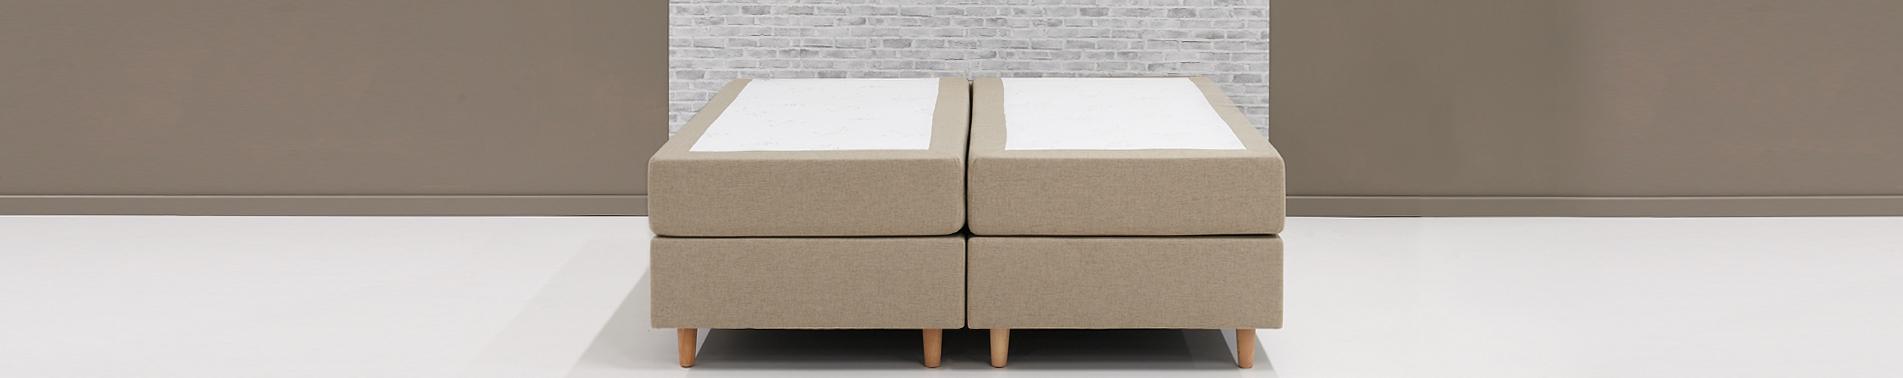 boxspringbett ohne kopfteil kaufen swiss sense. Black Bedroom Furniture Sets. Home Design Ideas